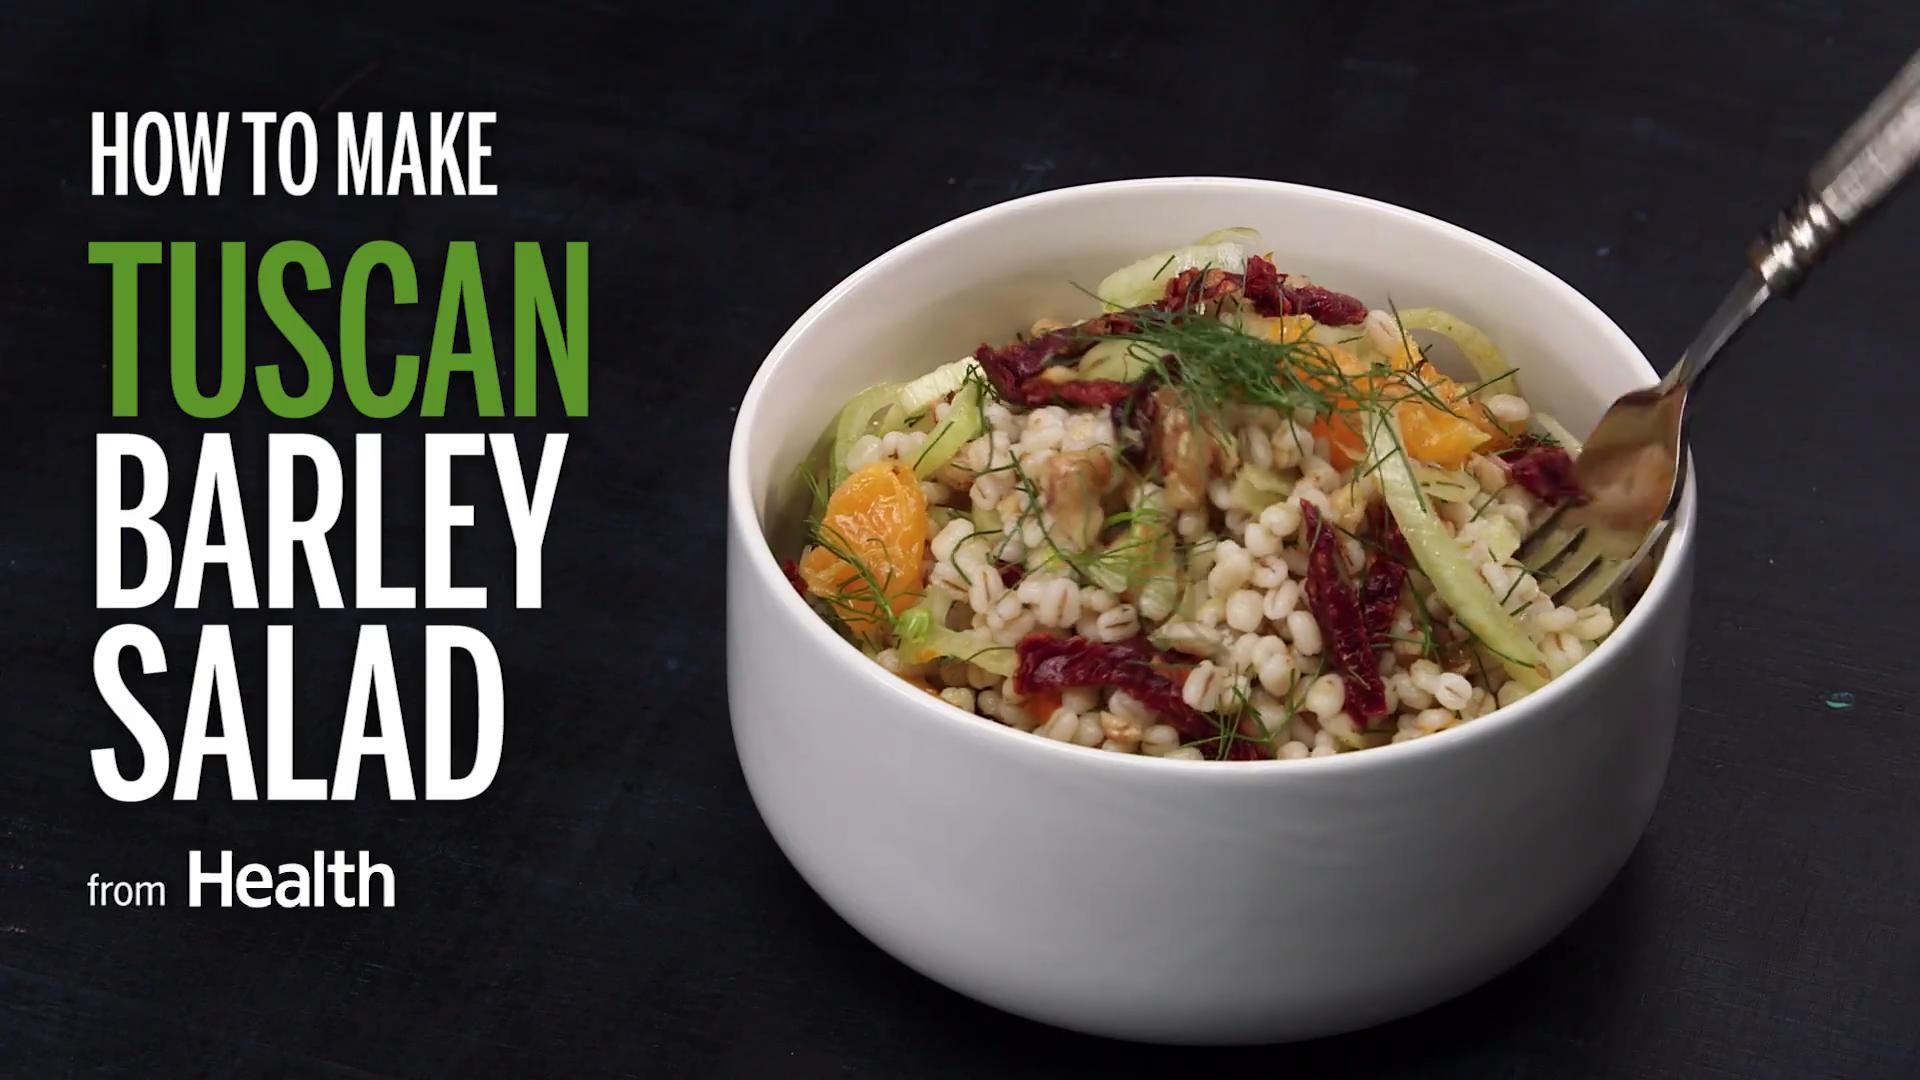 Tuscan Barley Salad